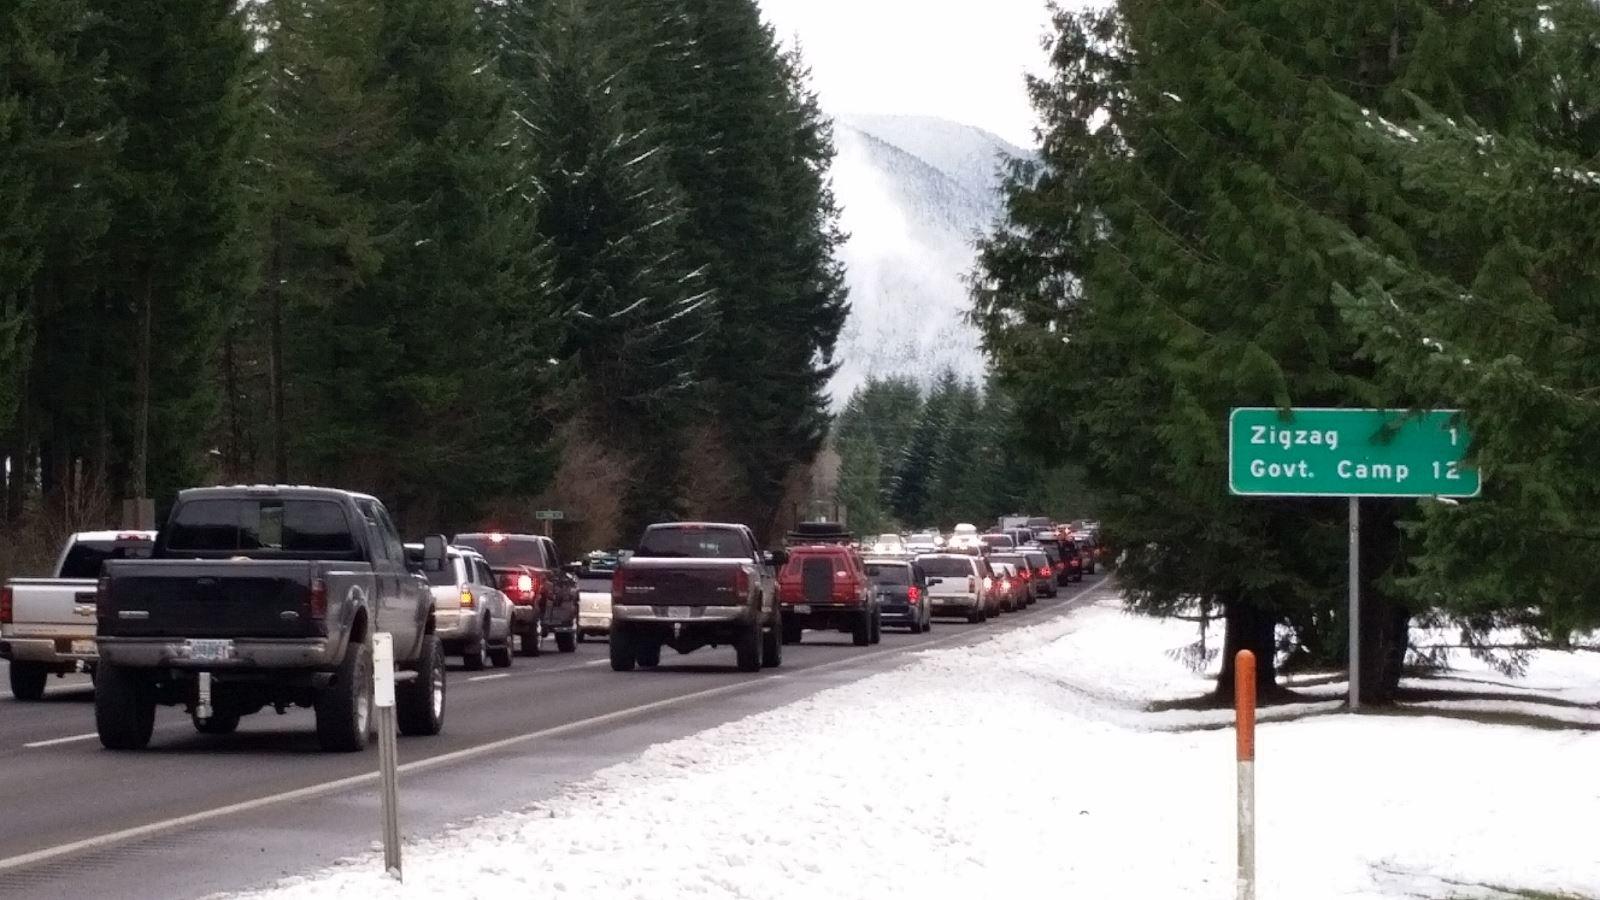 Mt. Hood Traffic Jam in Welches December 26, 2015